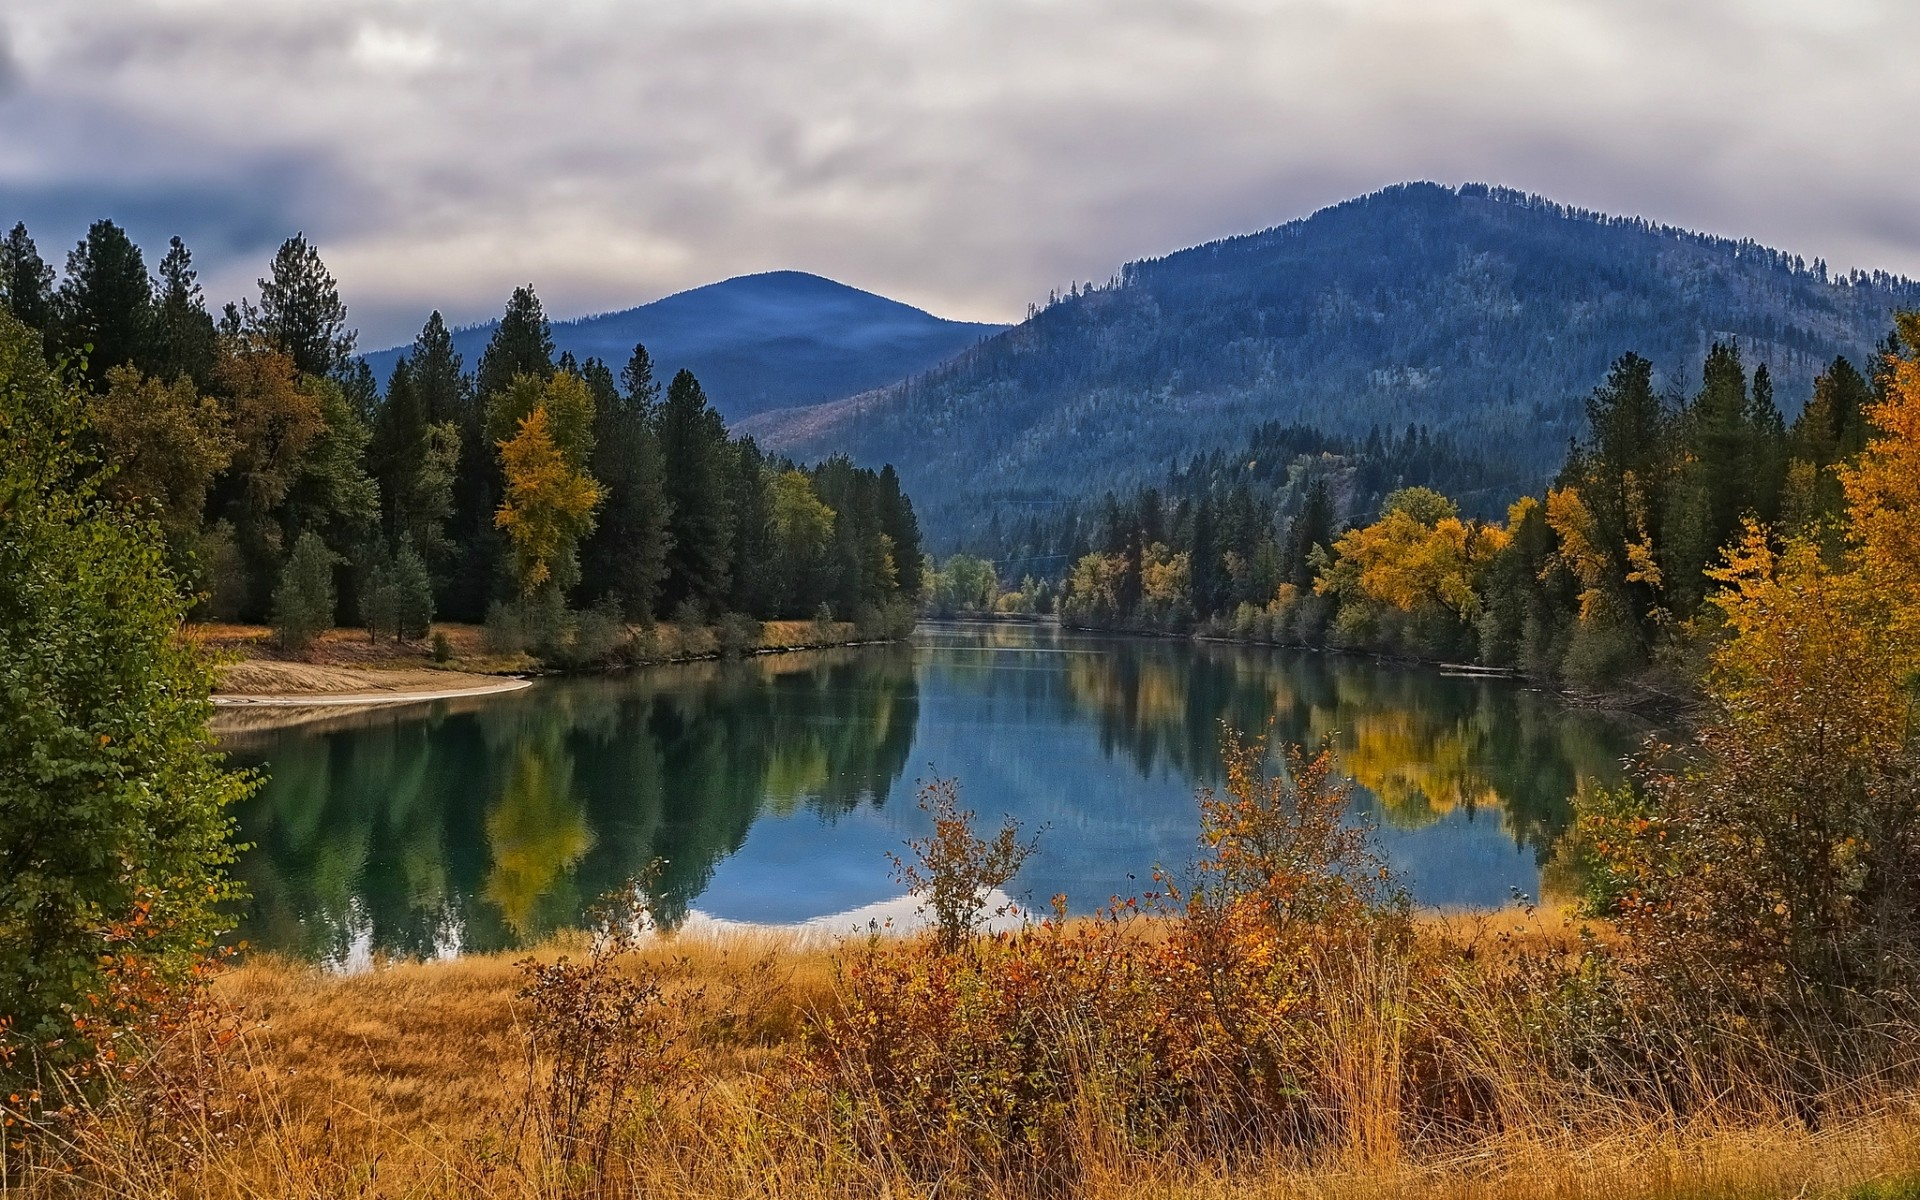 Fall Wallpapers For Desktop Idaho Blue Ridge Mountains Desktop Wallpaper 45 Images